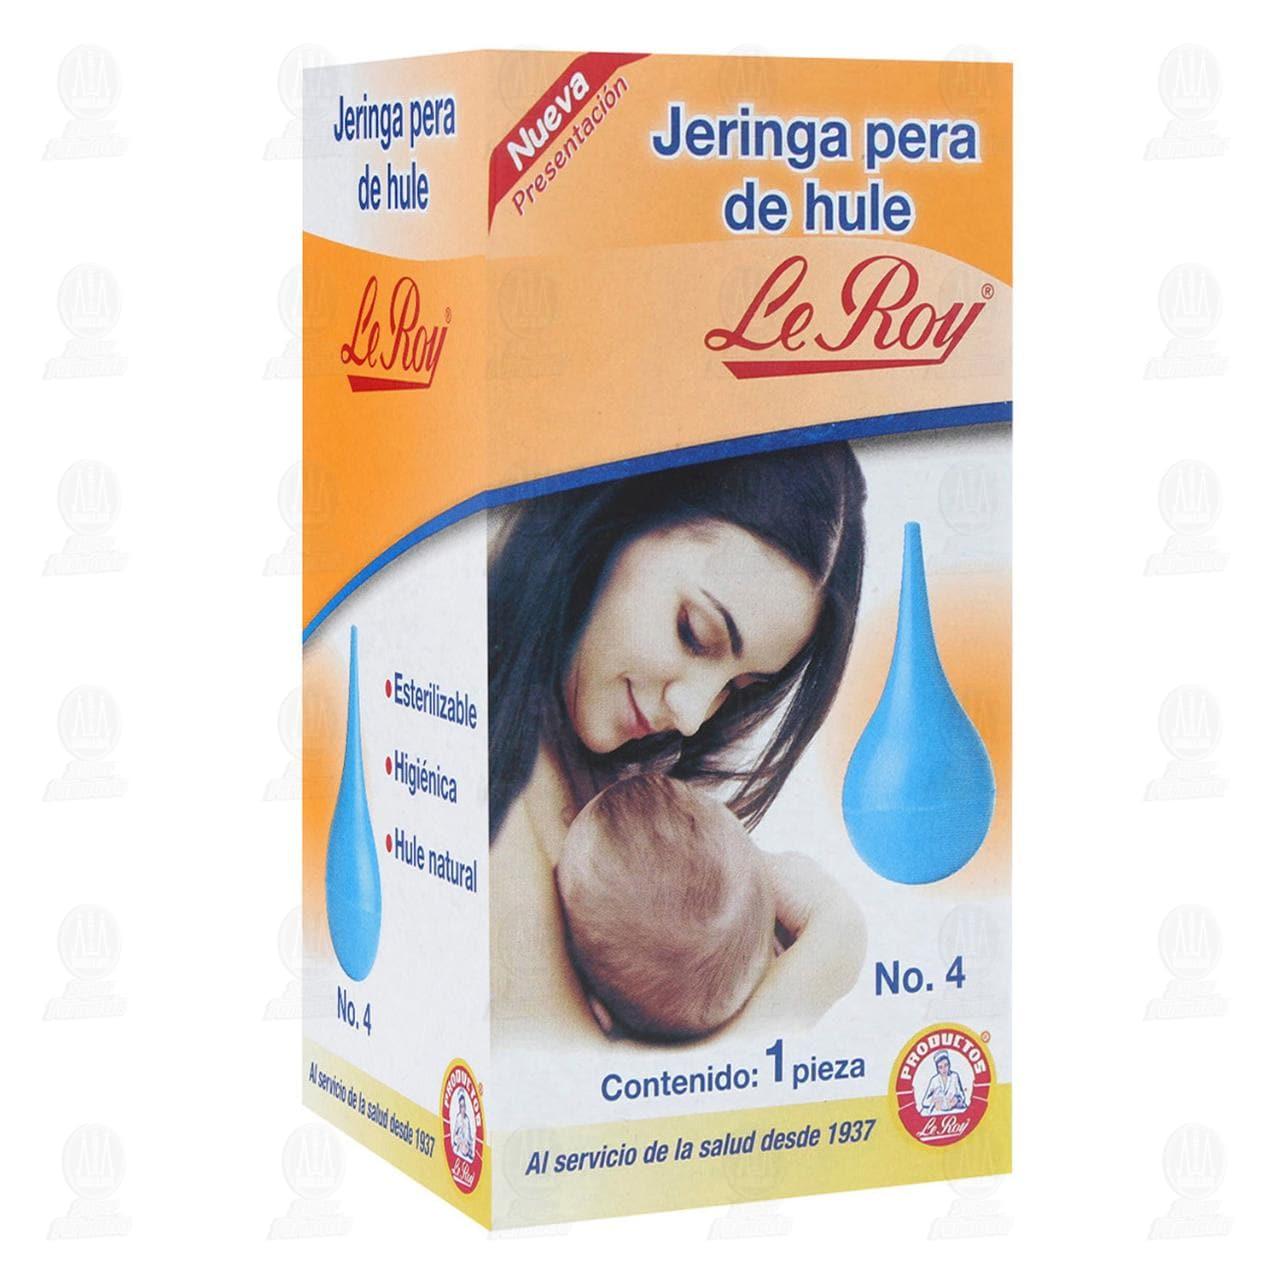 Comprar Jeringa Pera Le Roy de Hule No.4 1pz en Farmacias Guadalajara